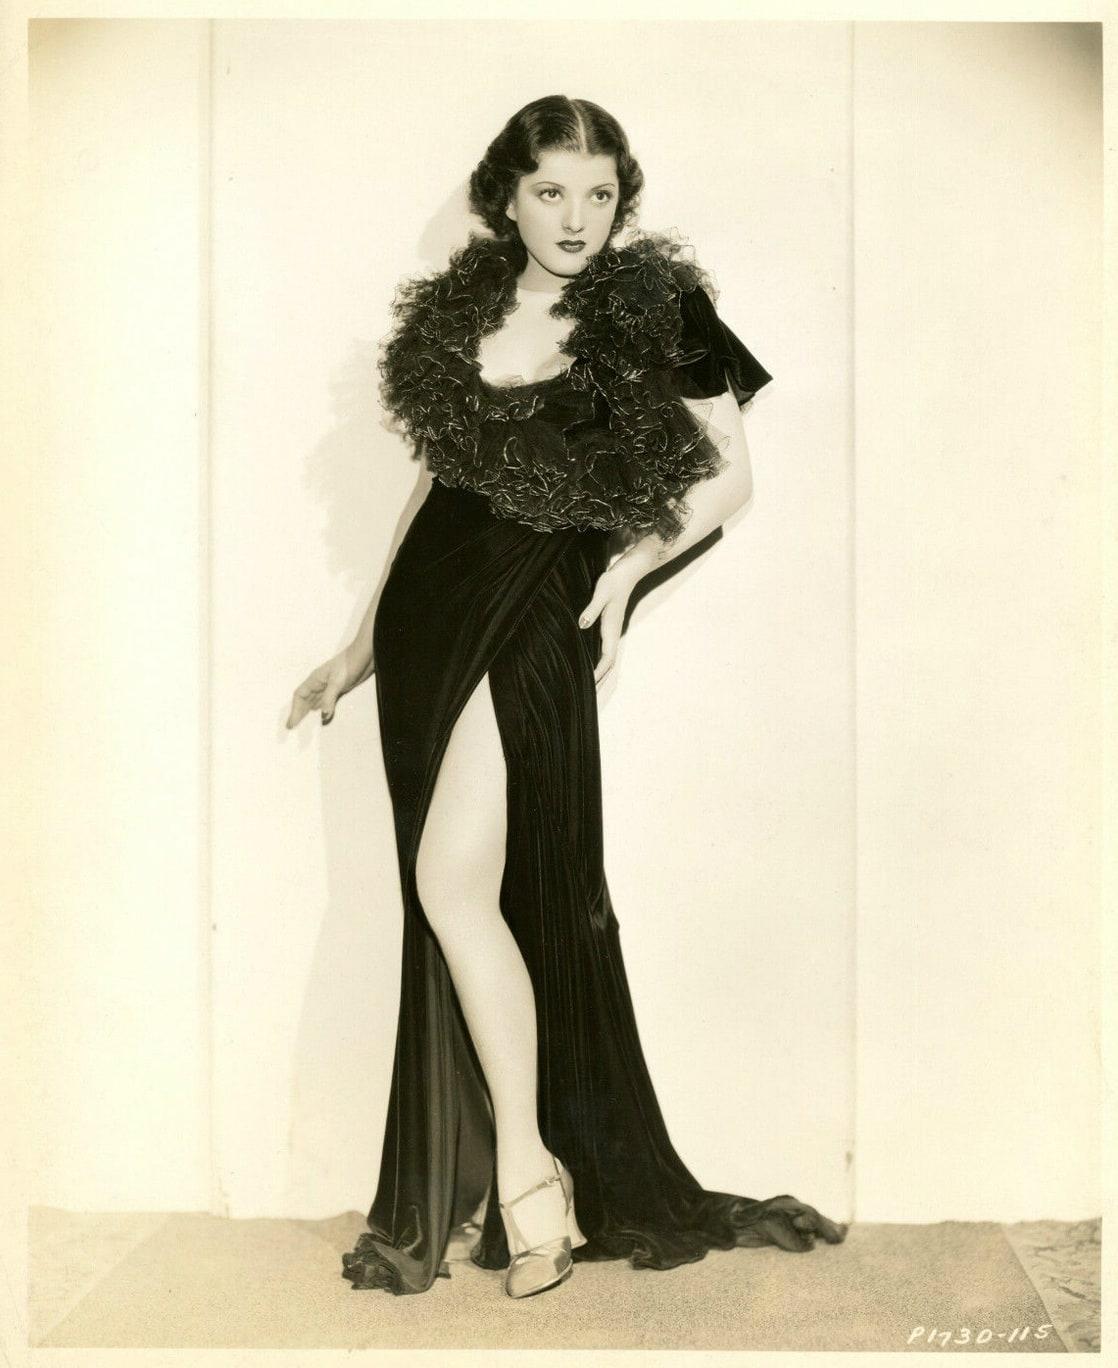 Cyndi Lauper,Brynn Rumfallo Sex pics & movies John Gregson (1919?975),Peggy Ann Garner